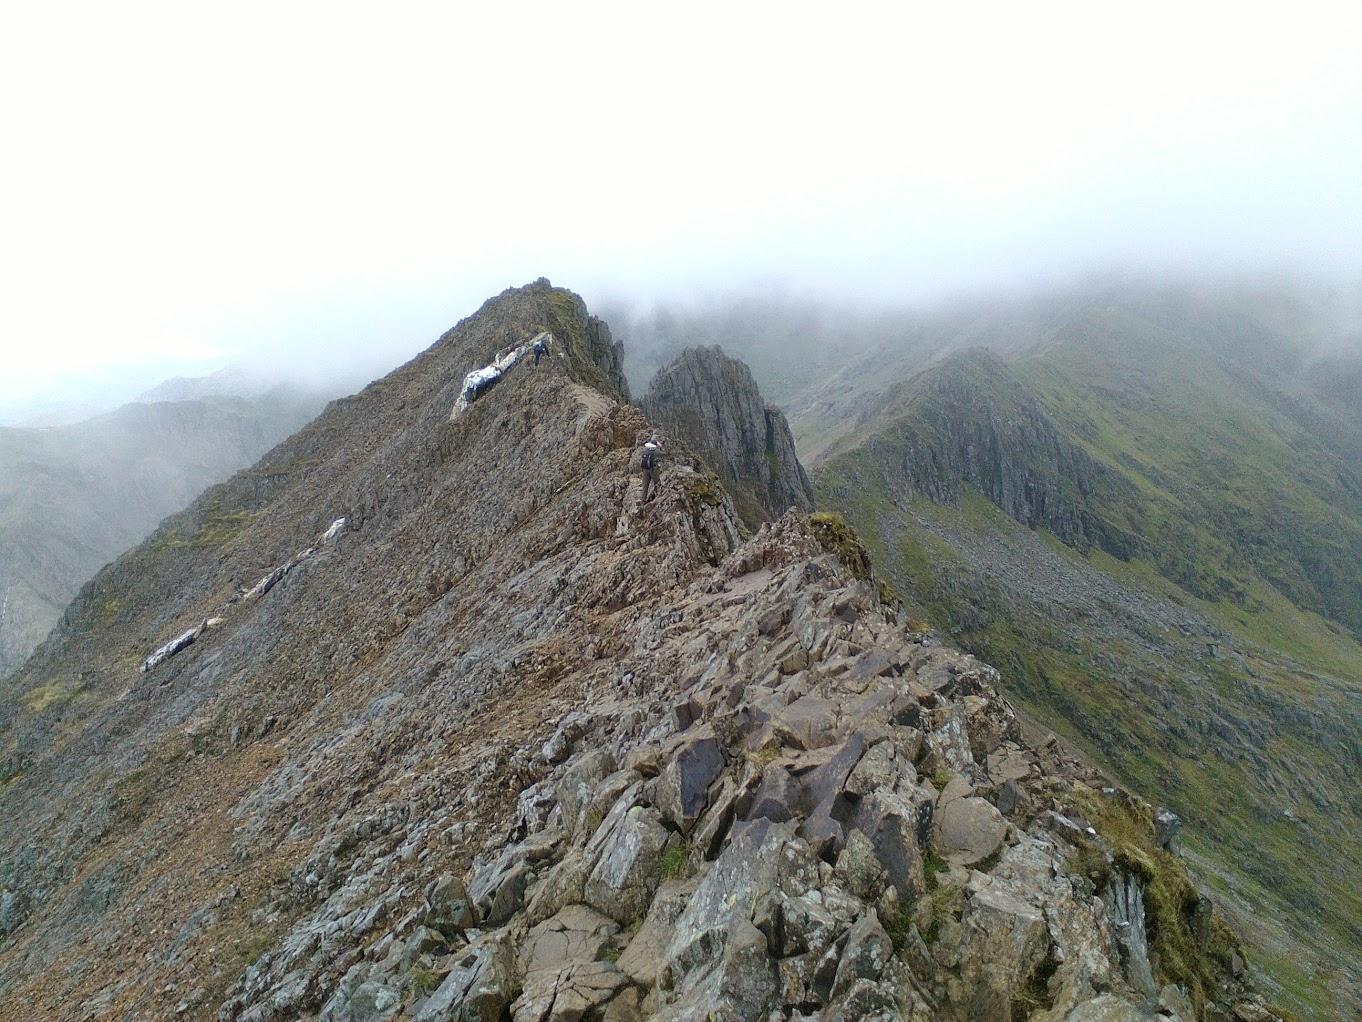 Looking back along the Crib Goch ridge